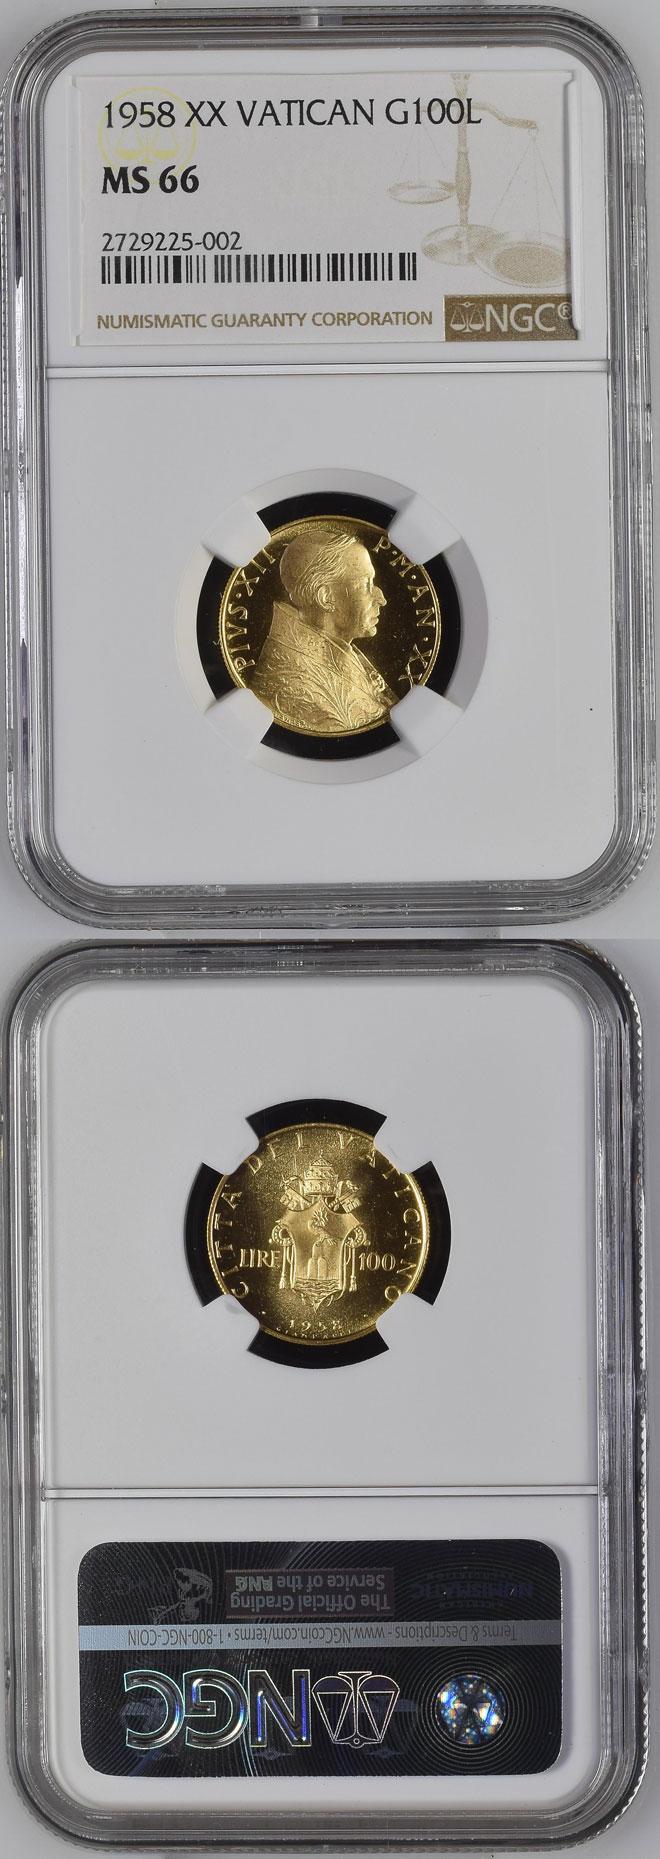 1958 Vatican 100 Lire Gold MS66 Photo